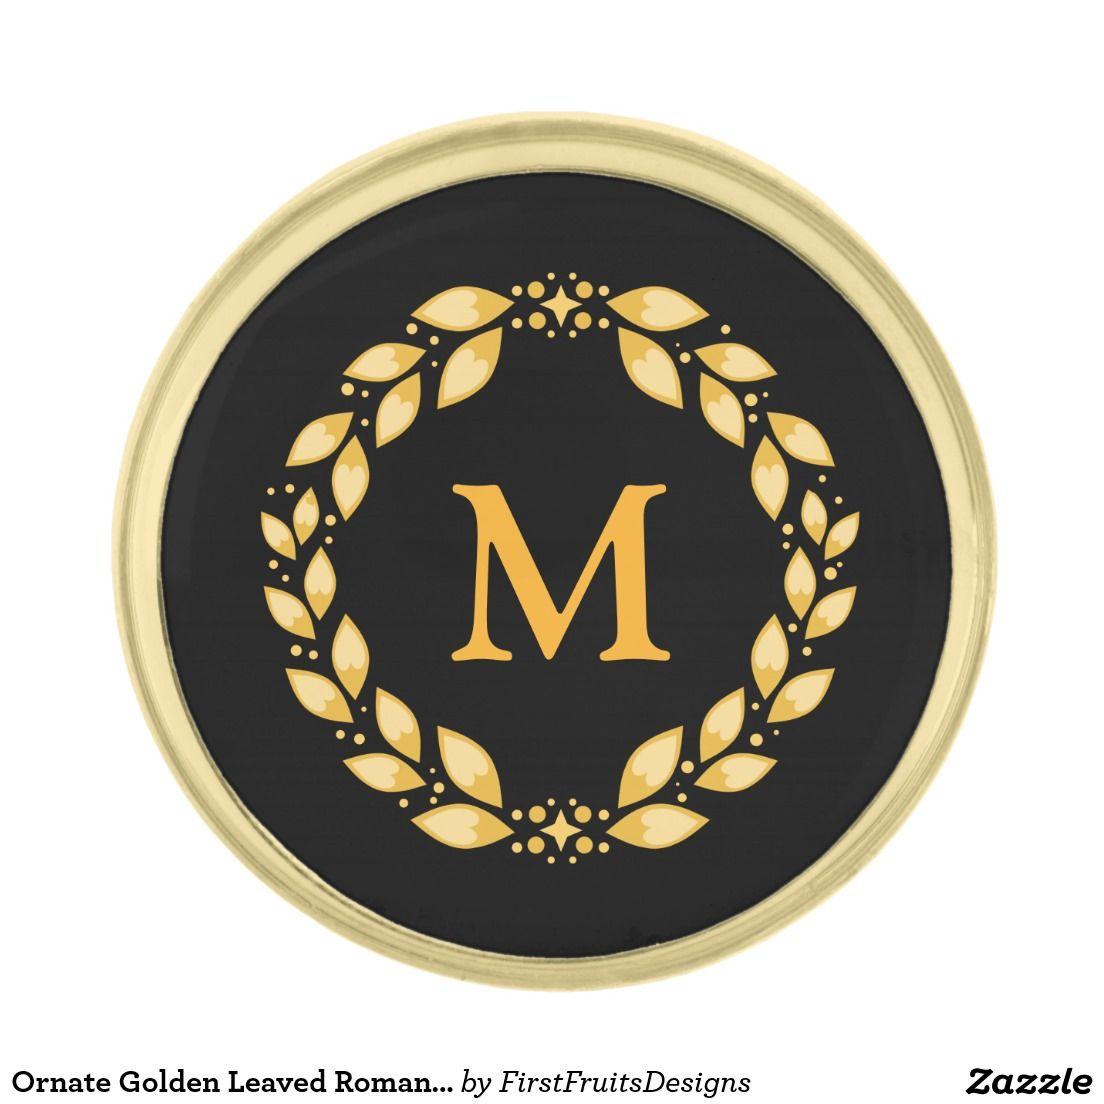 Ornate Golden Leaved Roman Wreath Monogram - Black Gold Finish Lapel Pin